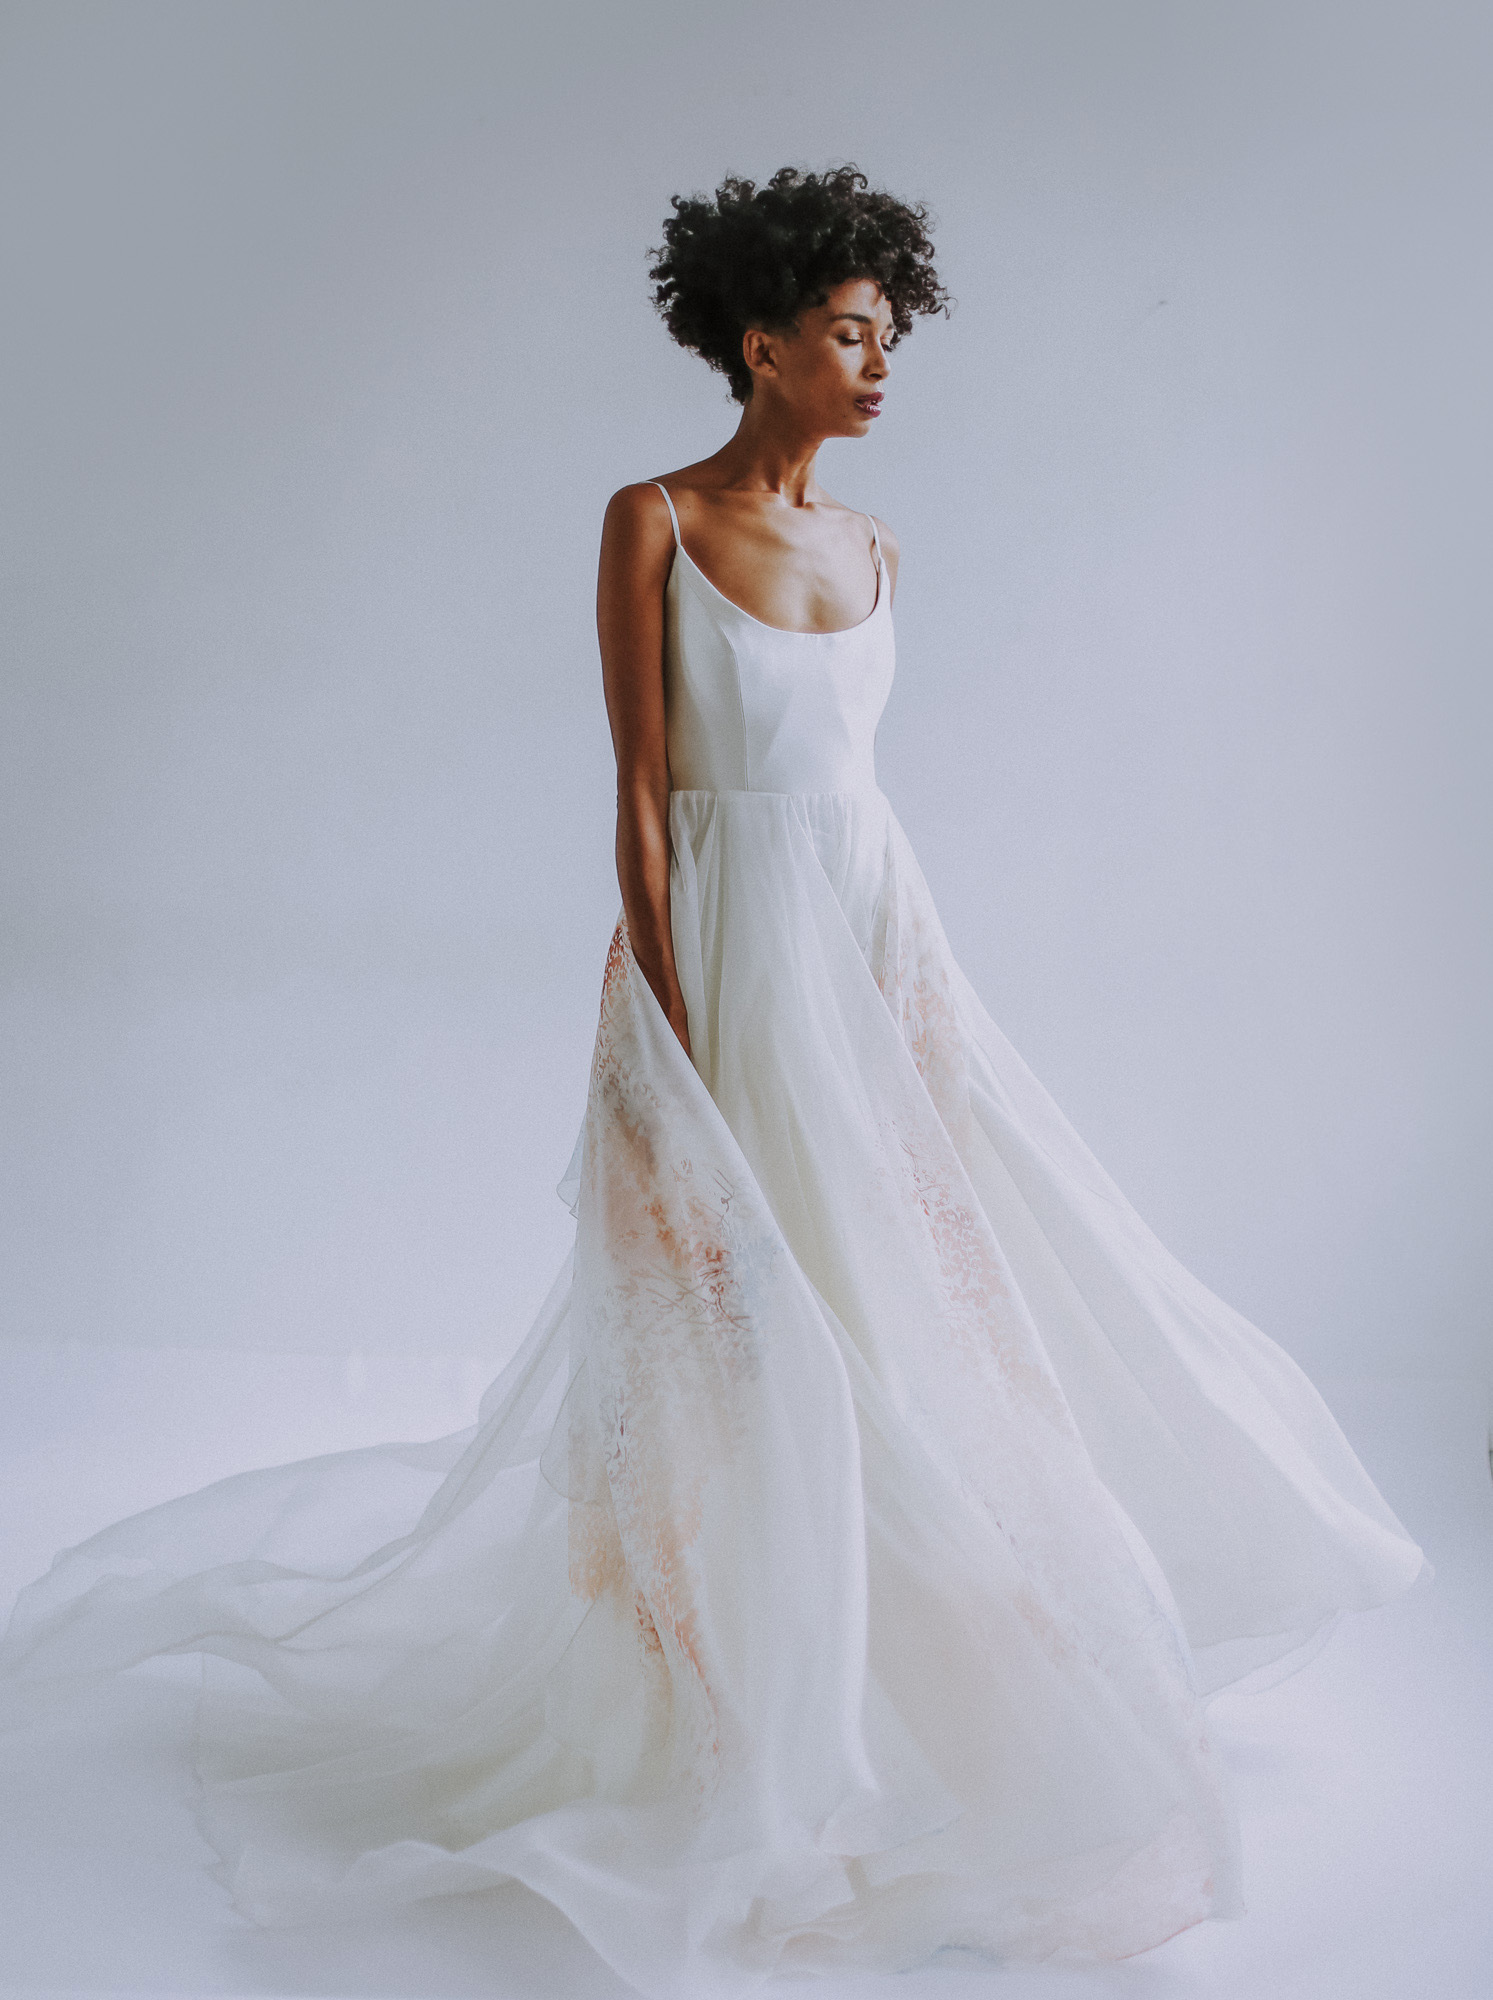 leanne-marshall-wedding-gown-7.jpg